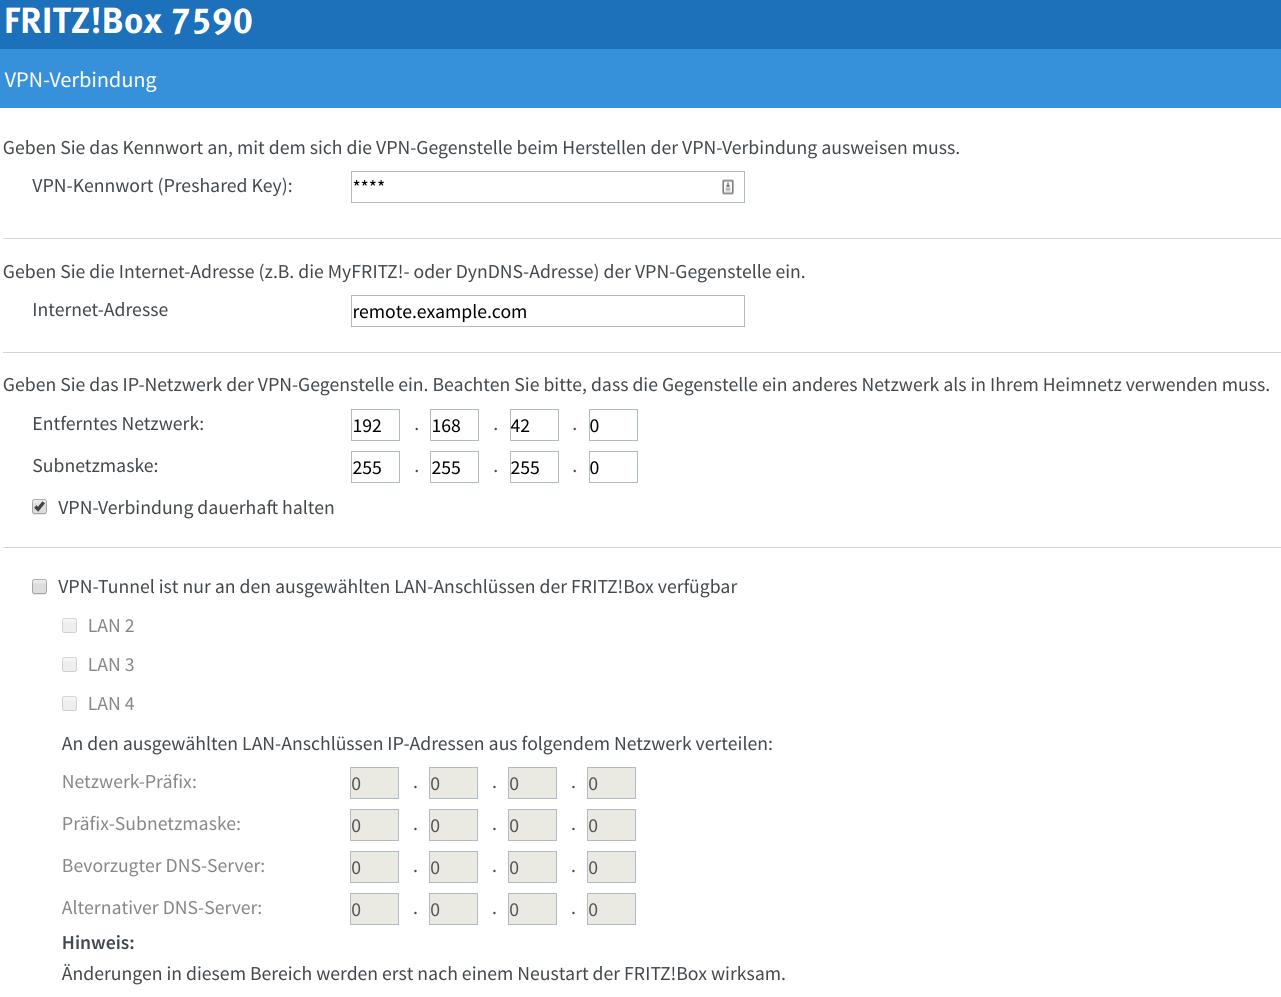 FritzBox LAN 2 LAN VPN with pfSense - Matthias Lohr